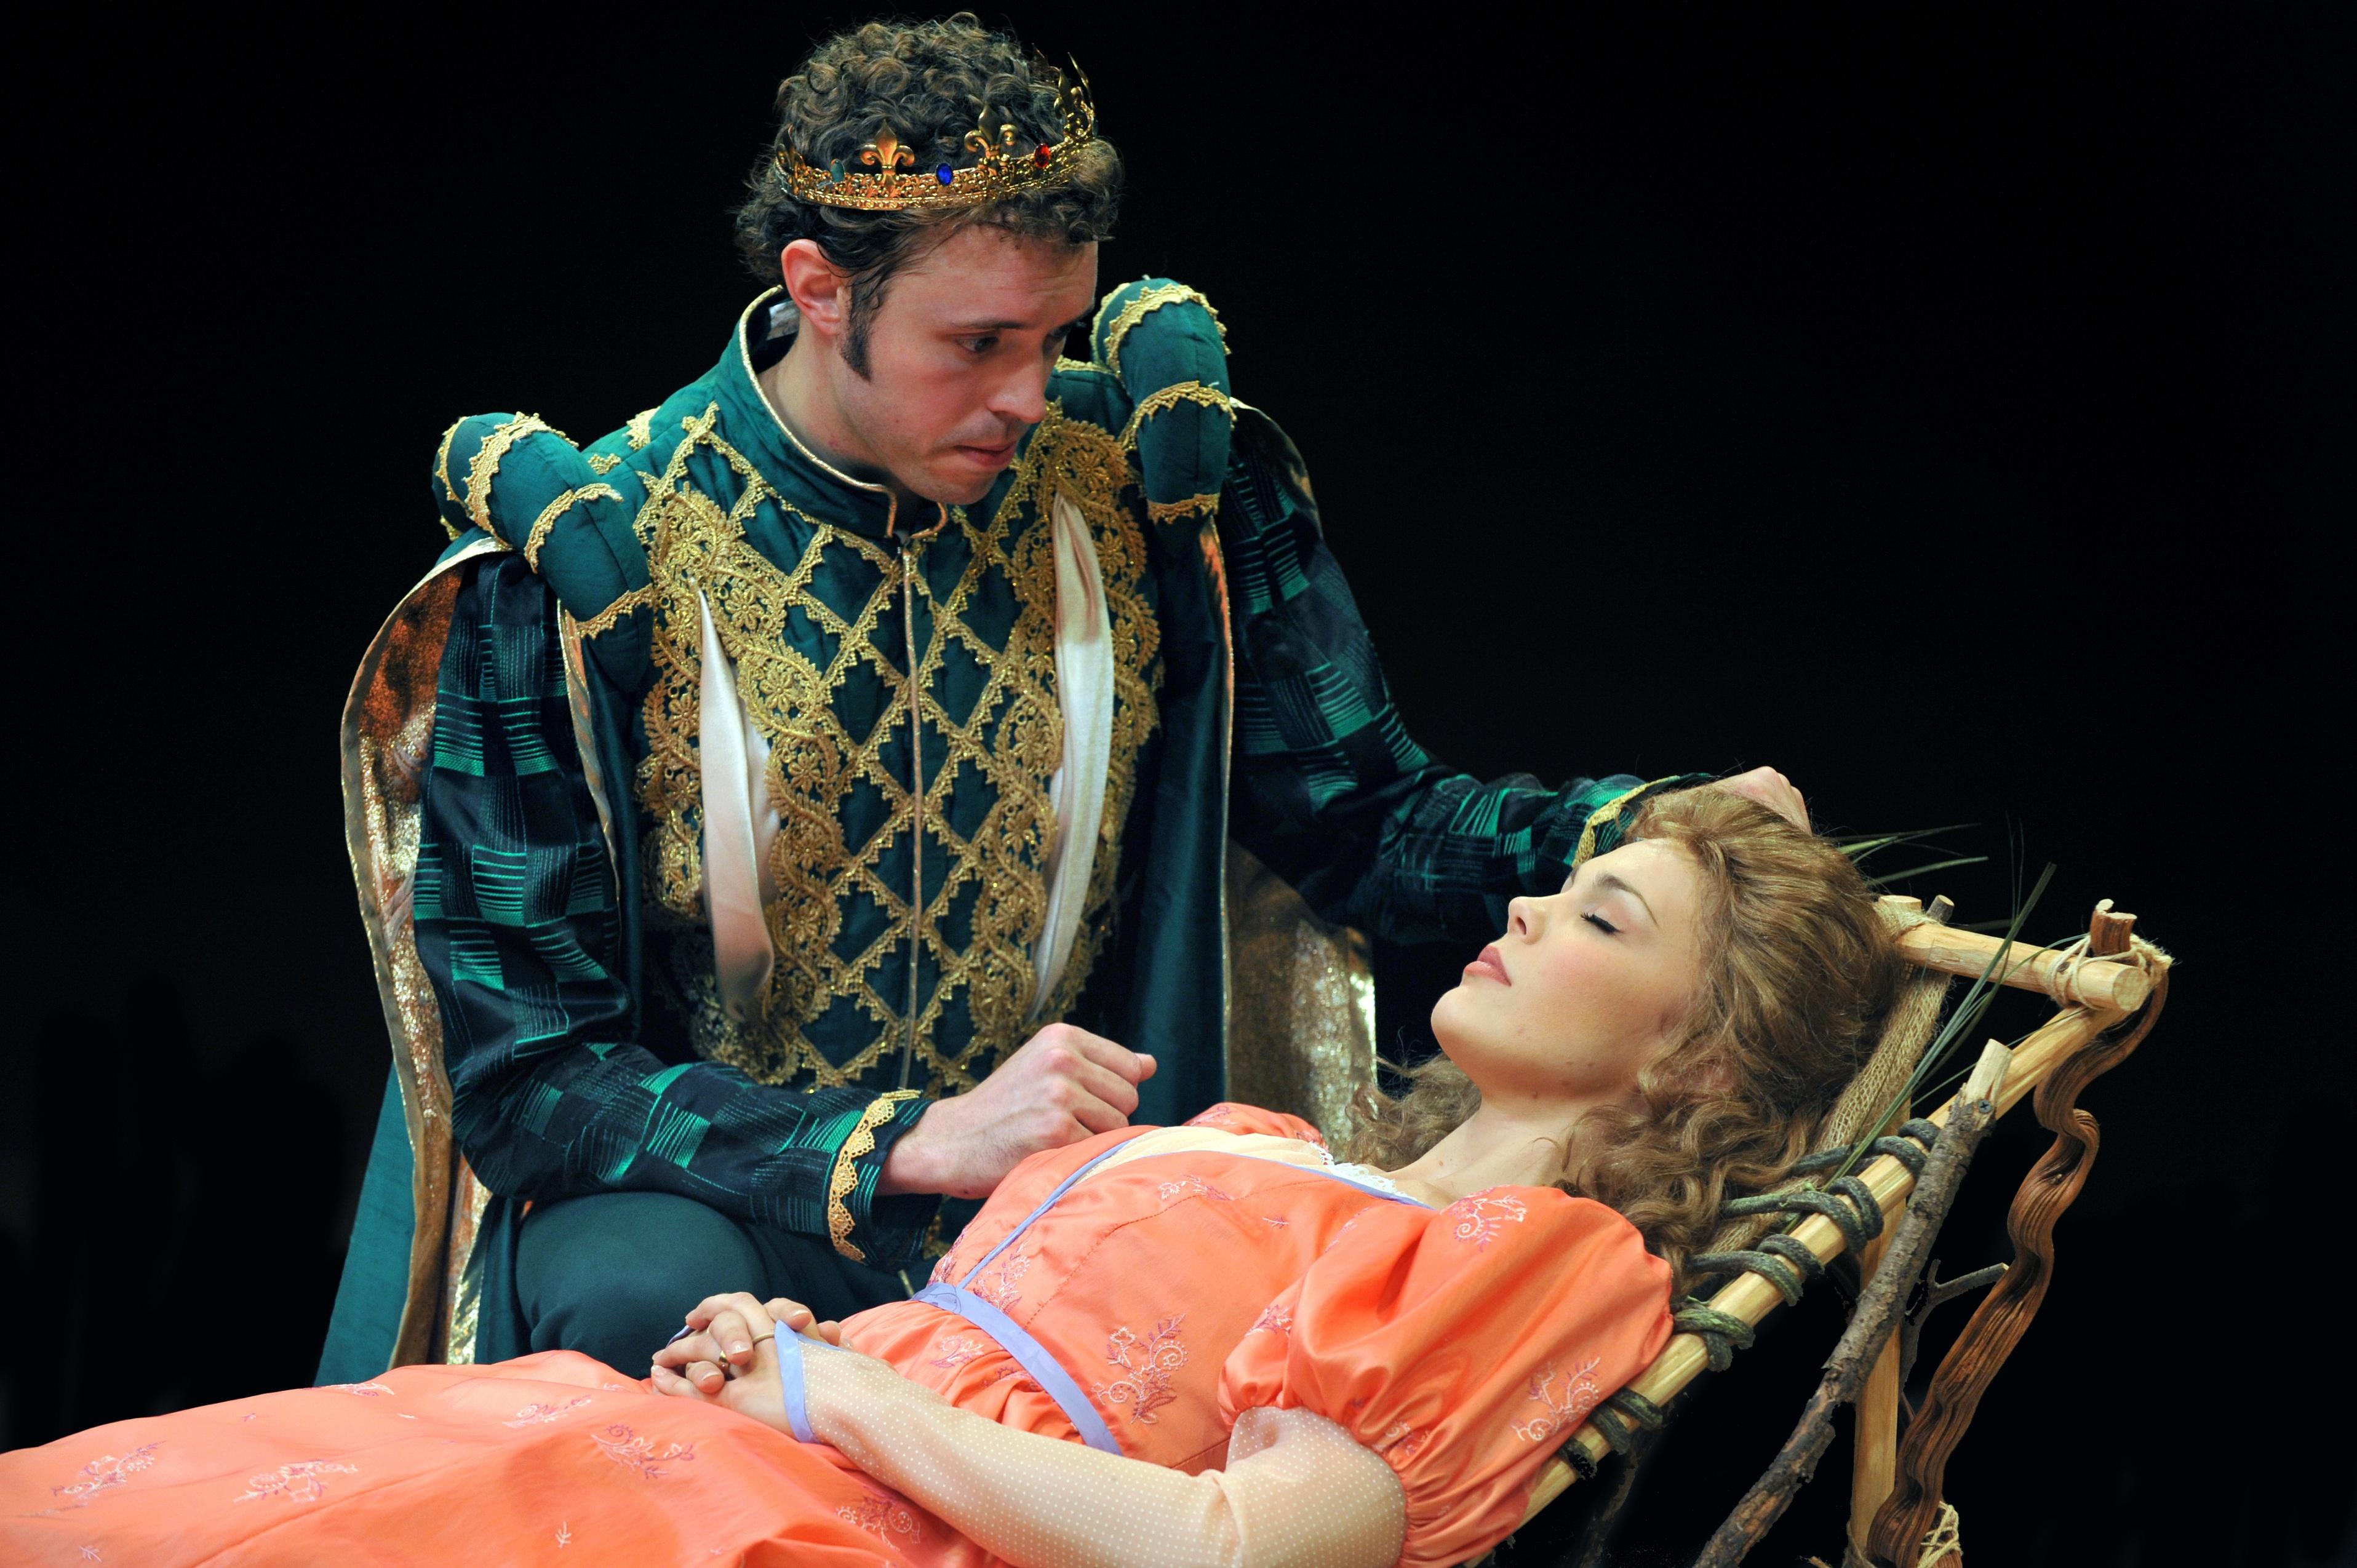 Lincolnshire's 'Sleeping Beauty' Runs July 7th-Aug. 18th